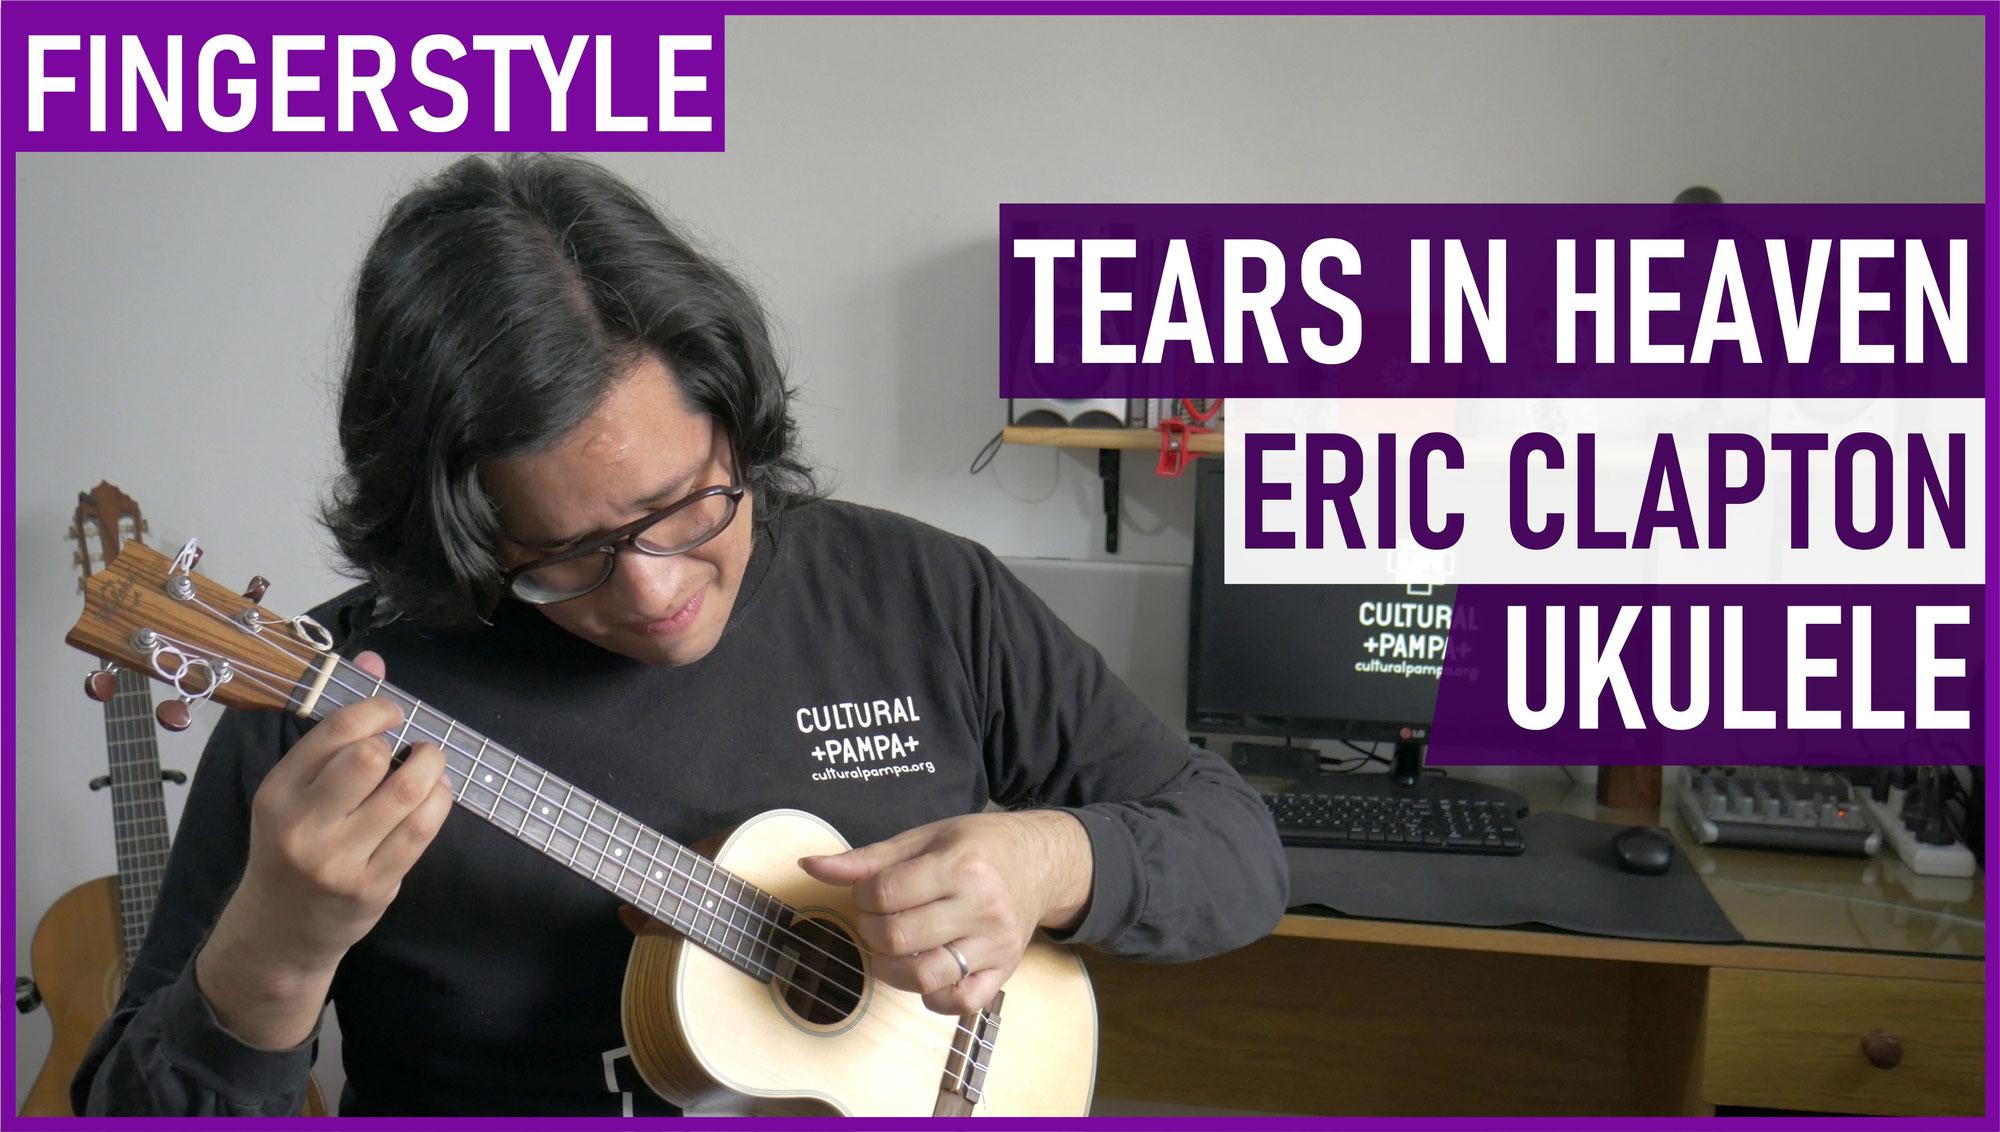 Tears in Heaven (Eric Clapton) | Ukelele Fingerstyle Cover